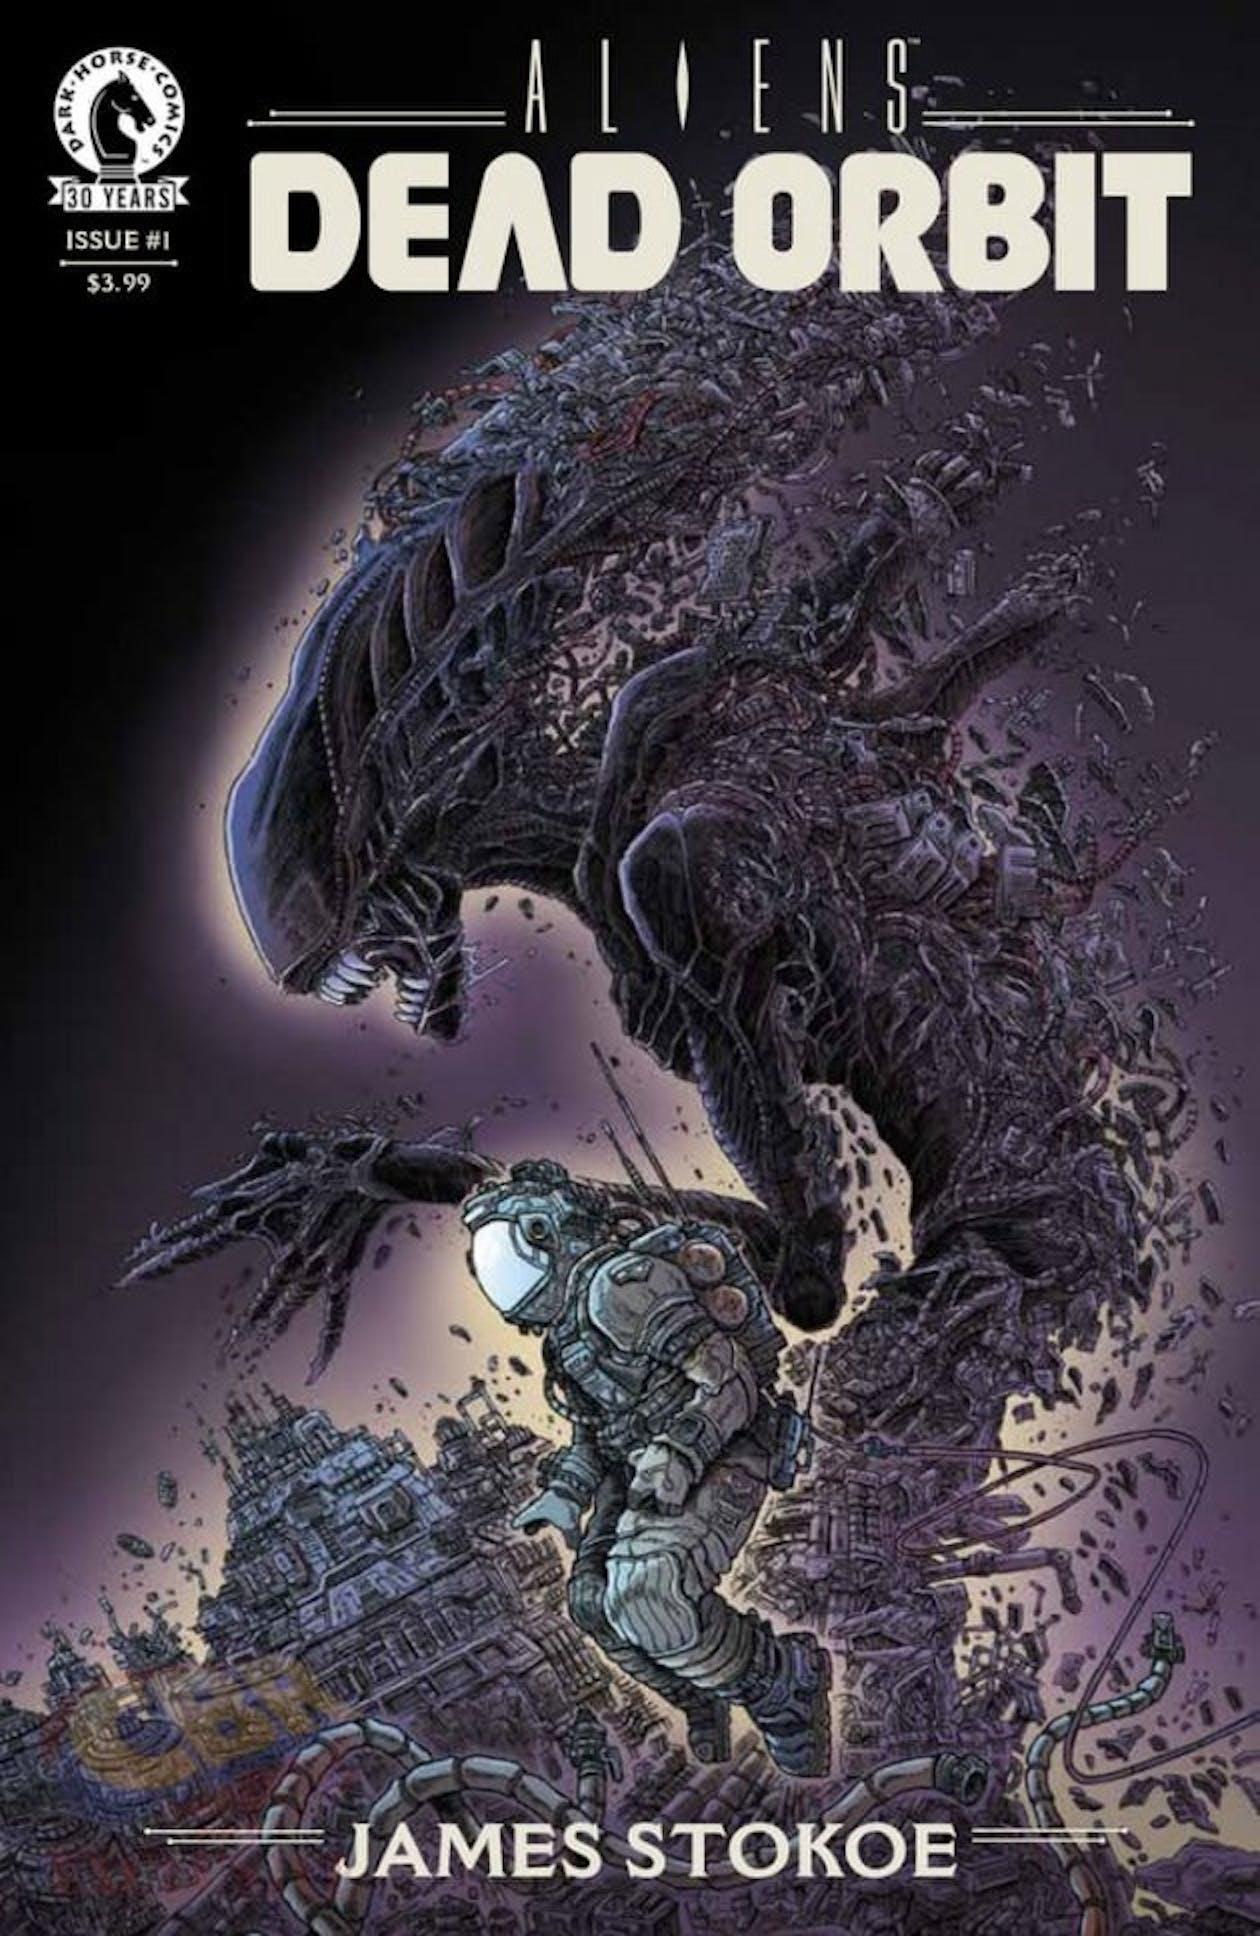 Aliens Dead Orbit from Dark Horse